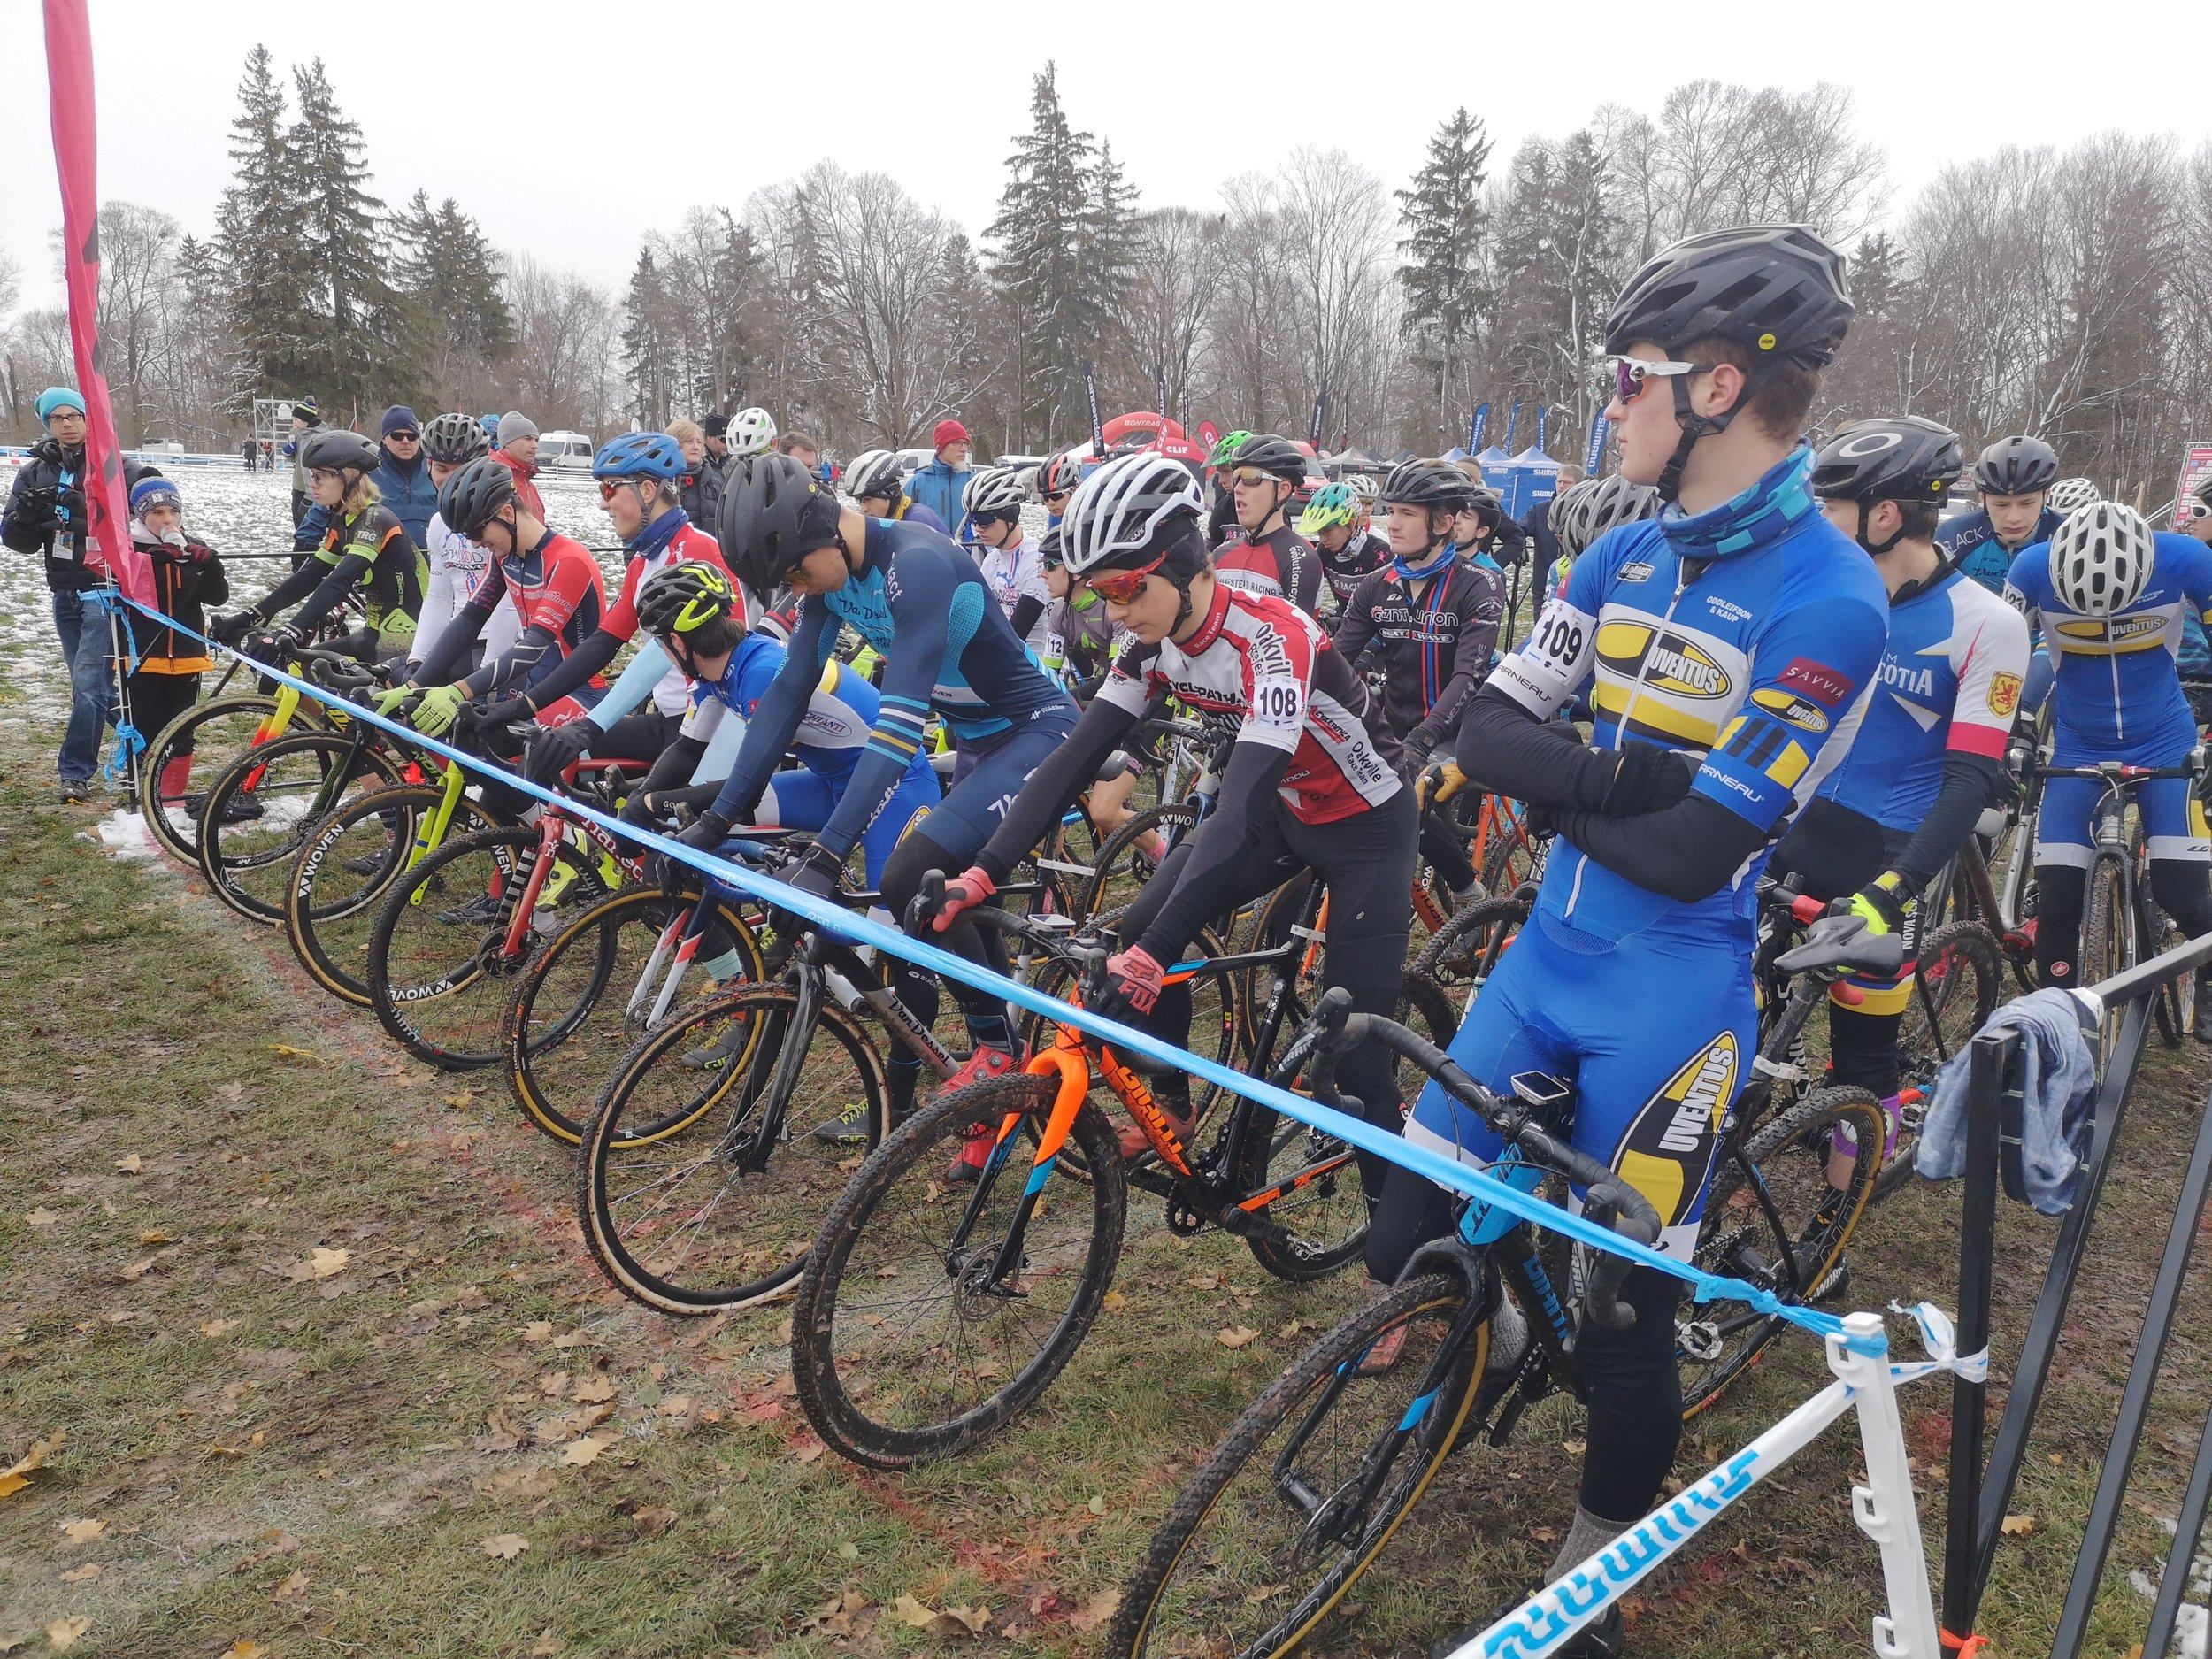 Luke and Ryan on start line of Sunday's UCI race